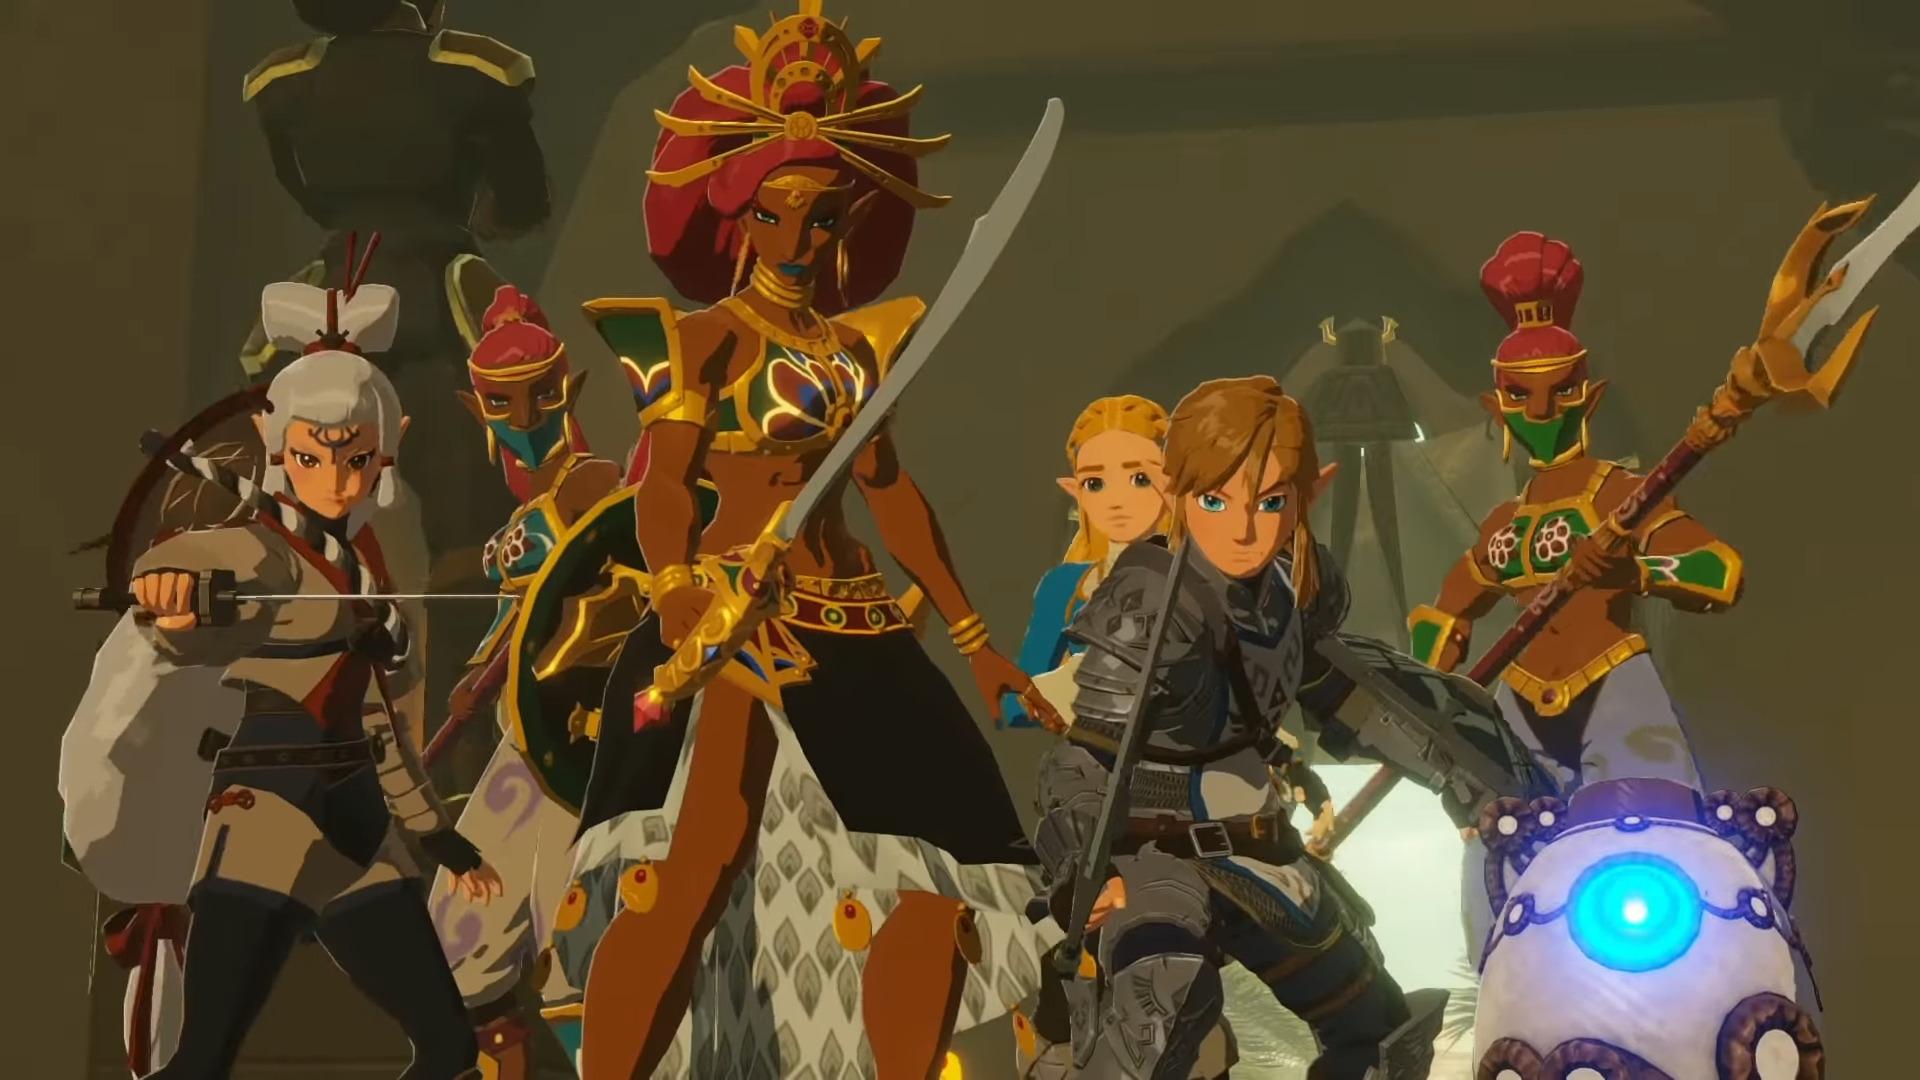 Hyrule Warriors  Age Of Calamity Receives New Trailer  Gameplay Footage  U2013 Rpgamer